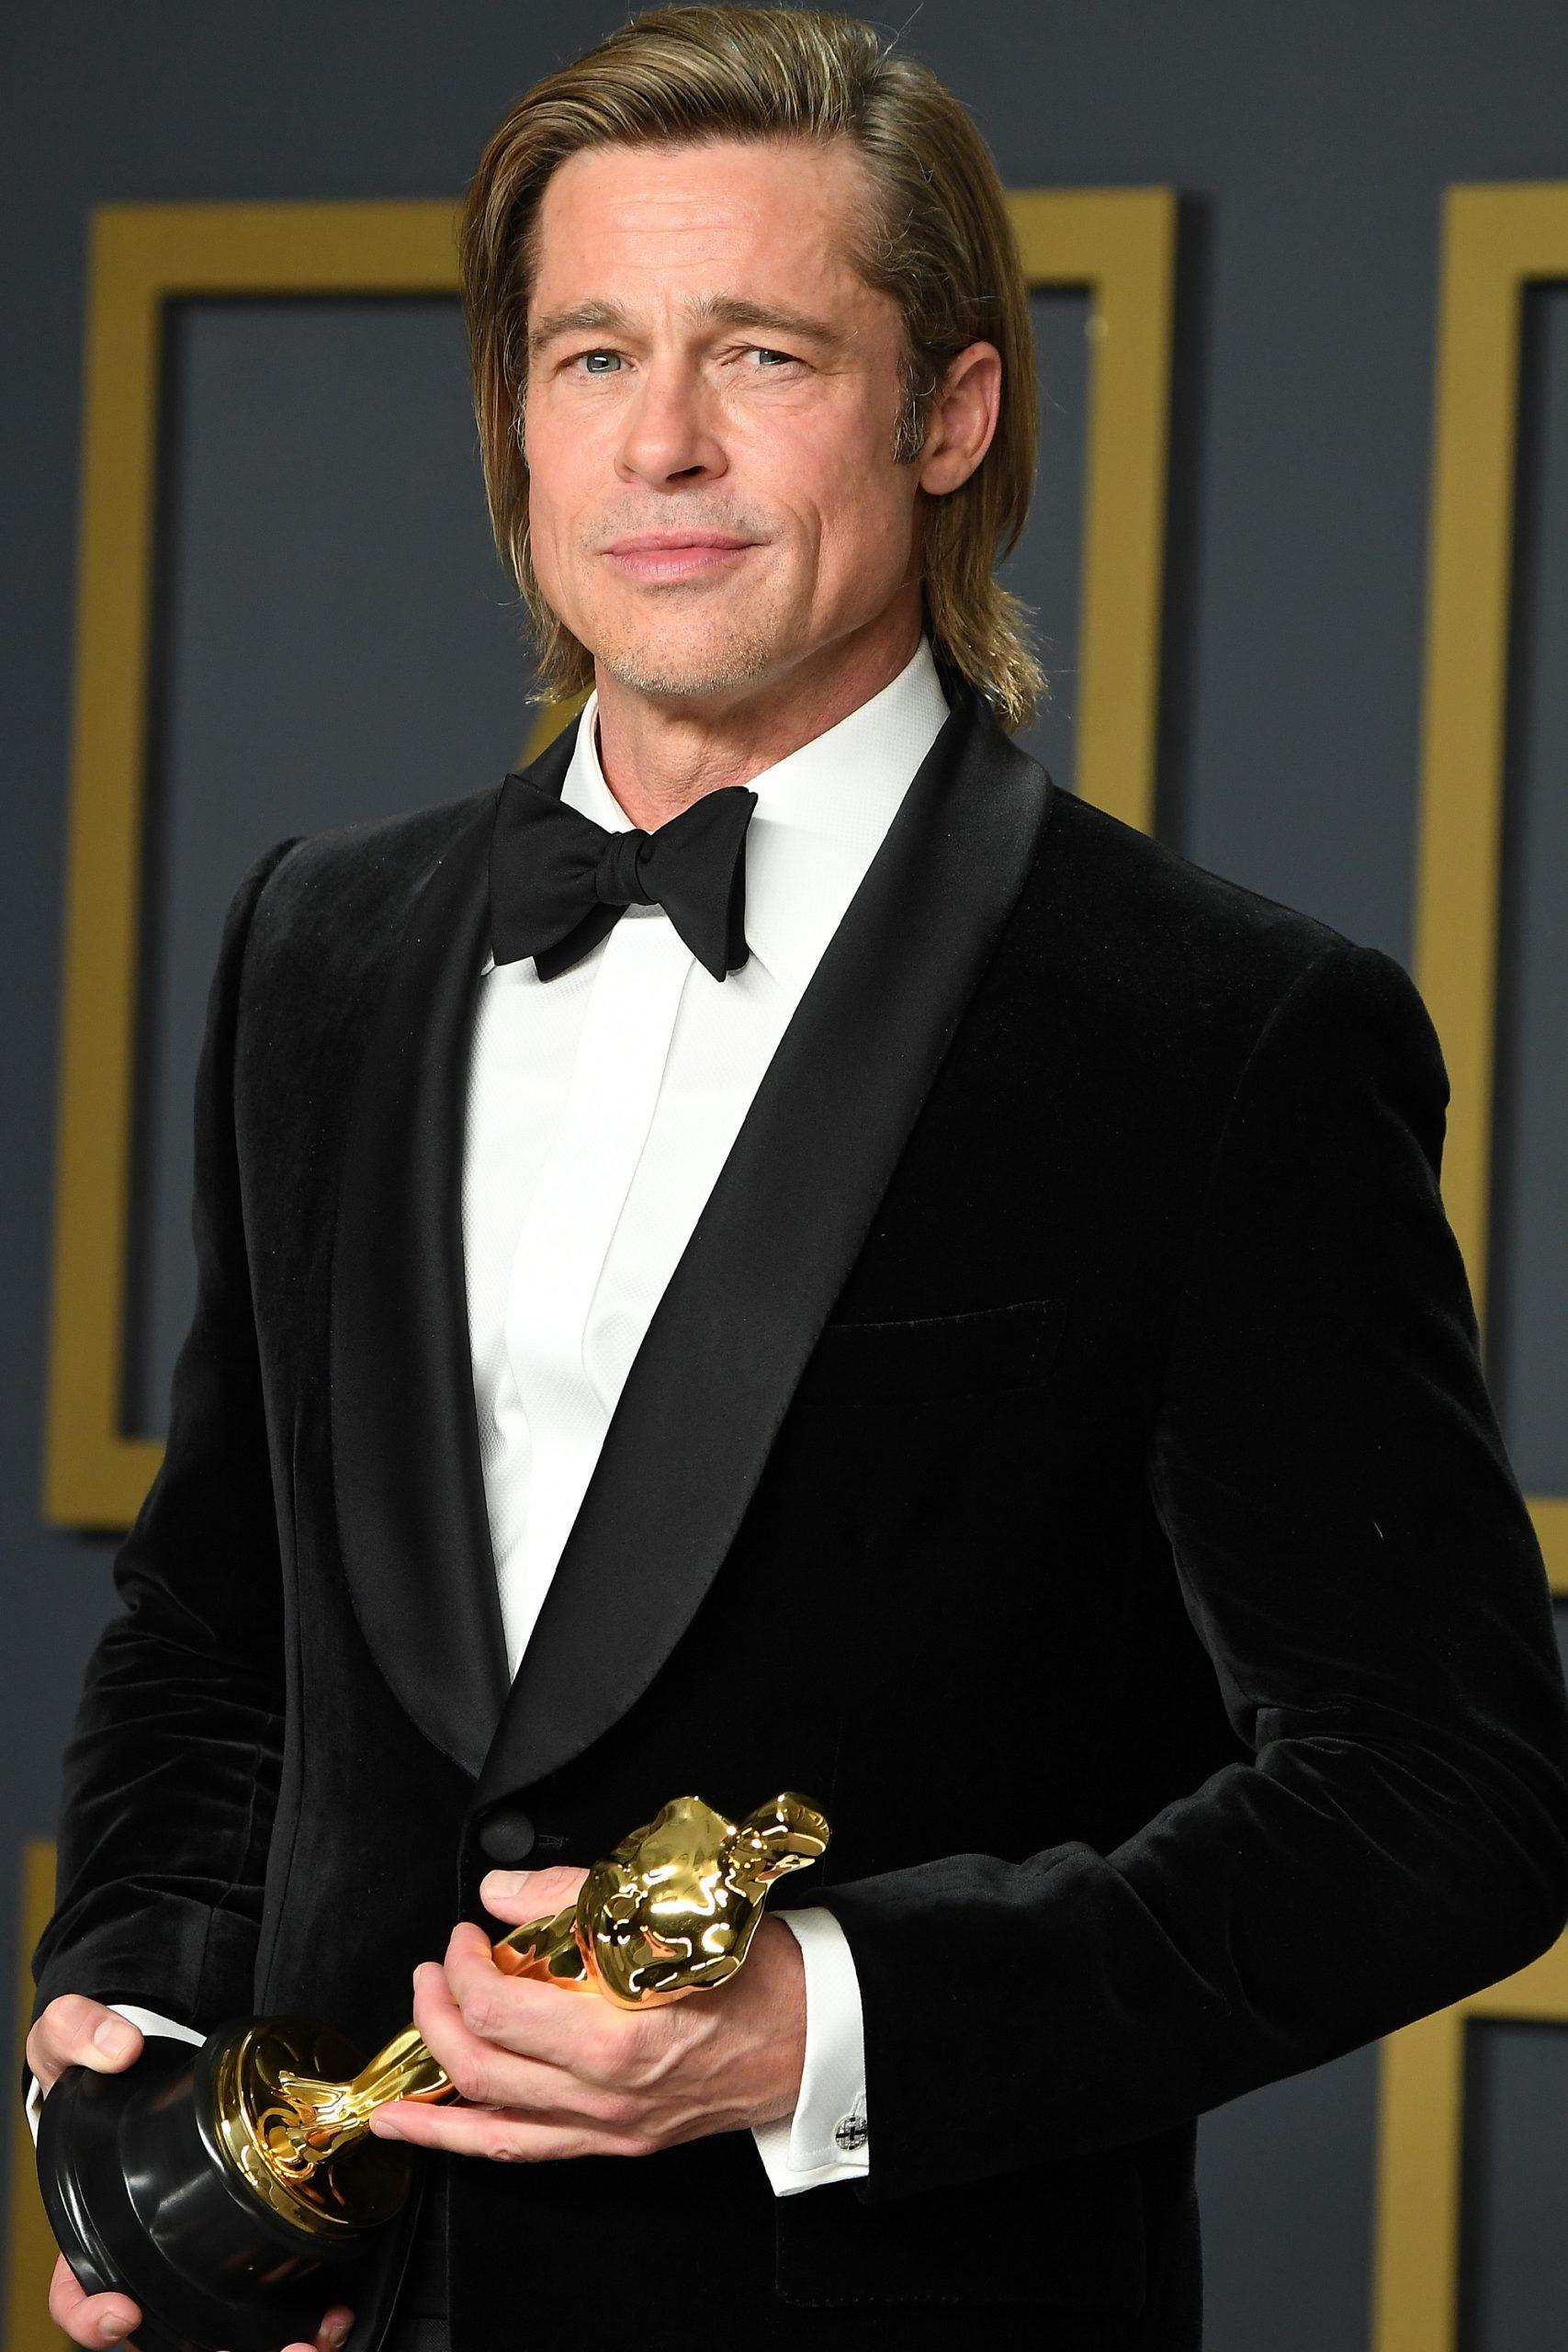 Brad Pitt - Botox & Collagen Smoothies